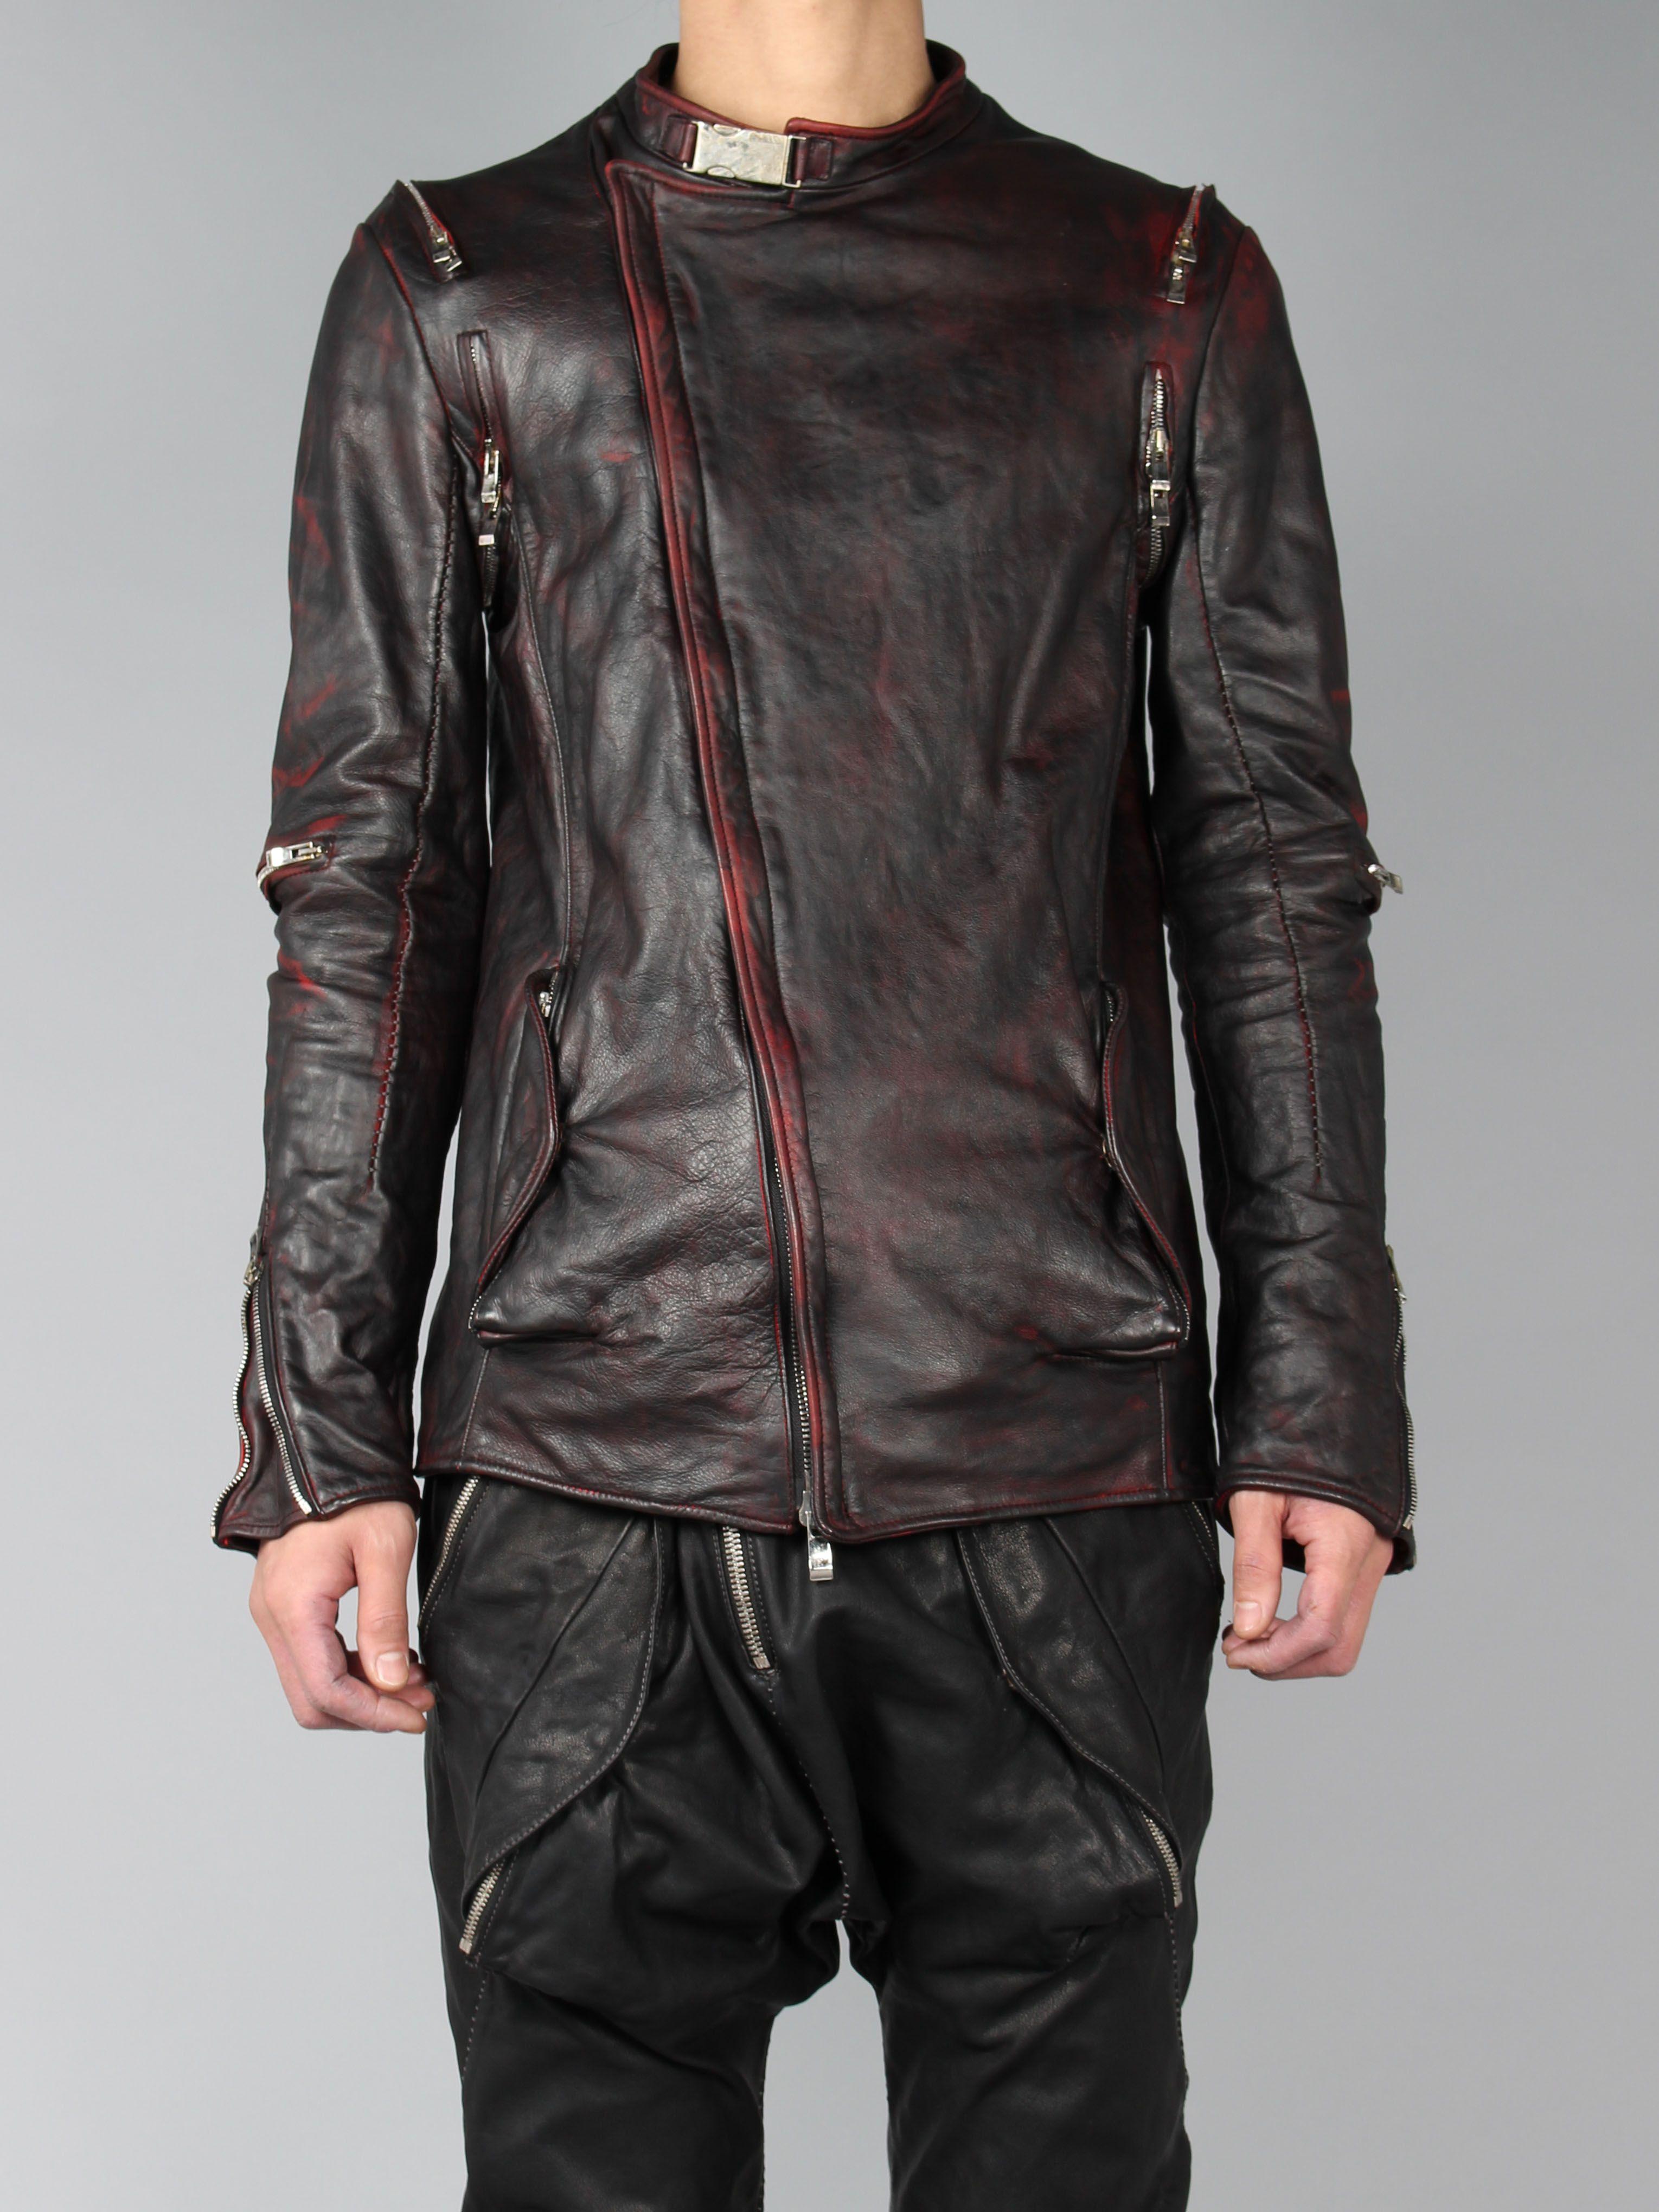 INCARNATION RED BIKER JACKET Jackets, Leather jacket